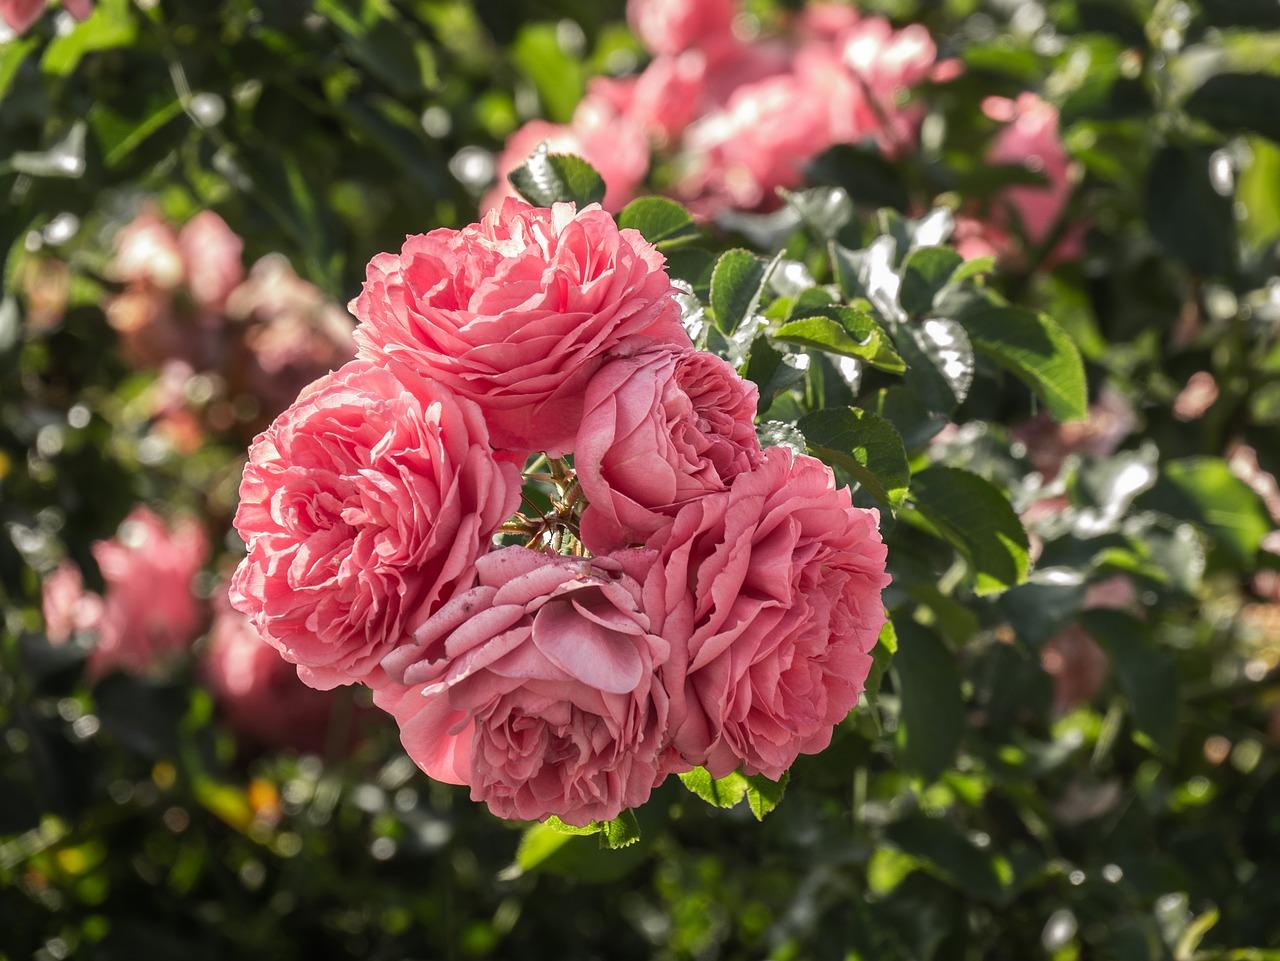 flowers, roses, rosebush